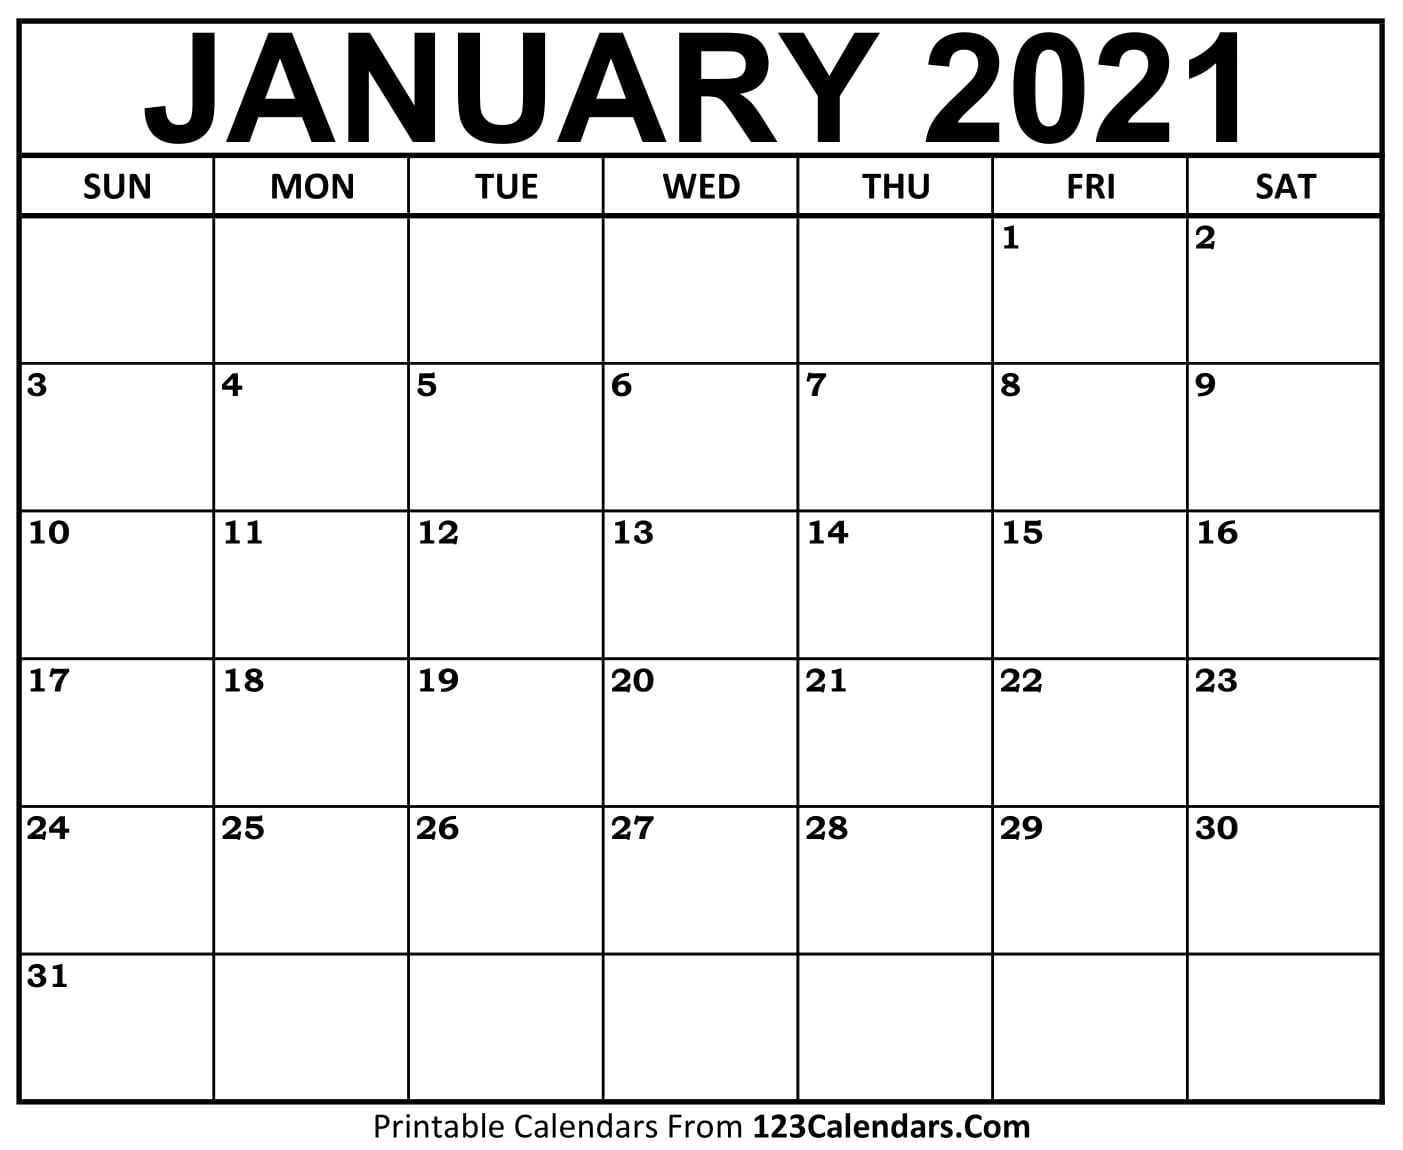 Printable January 2021 Calendar Templates | 123Calendars regarding Printable Fill In Calendar 2021